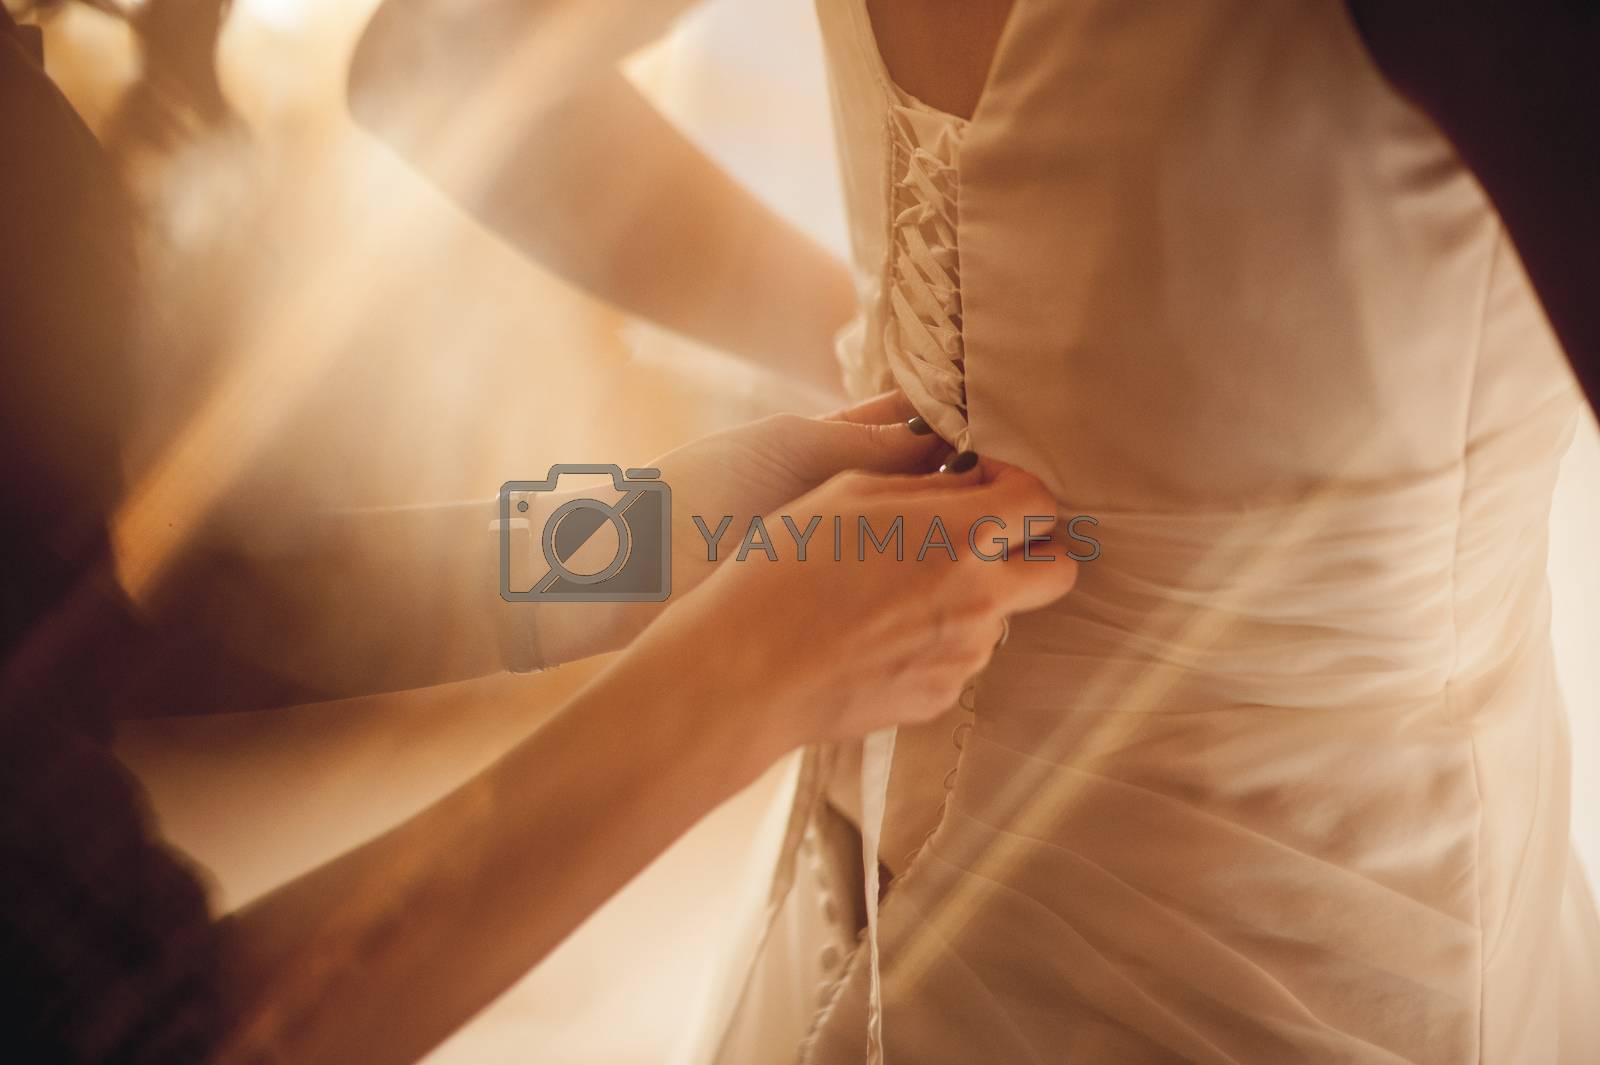 bride been helped putting on wedding dress